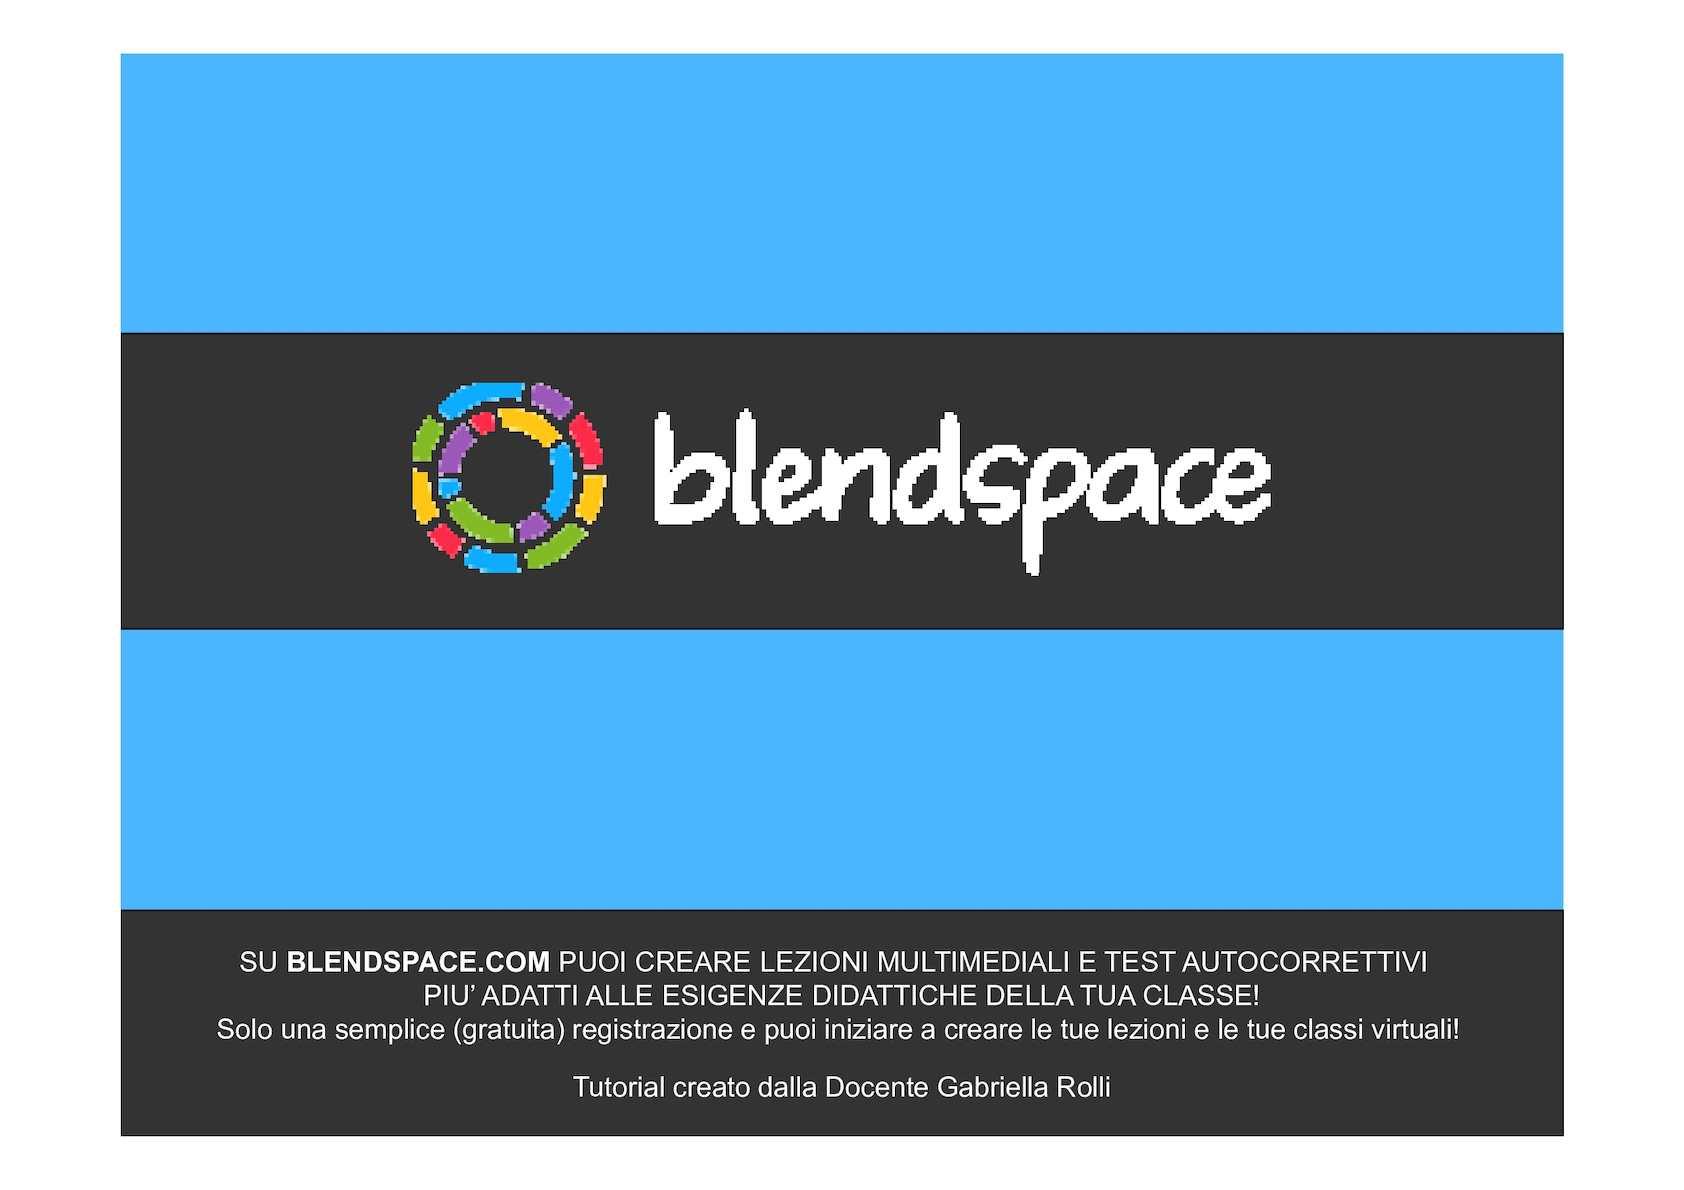 Blendspace 2016